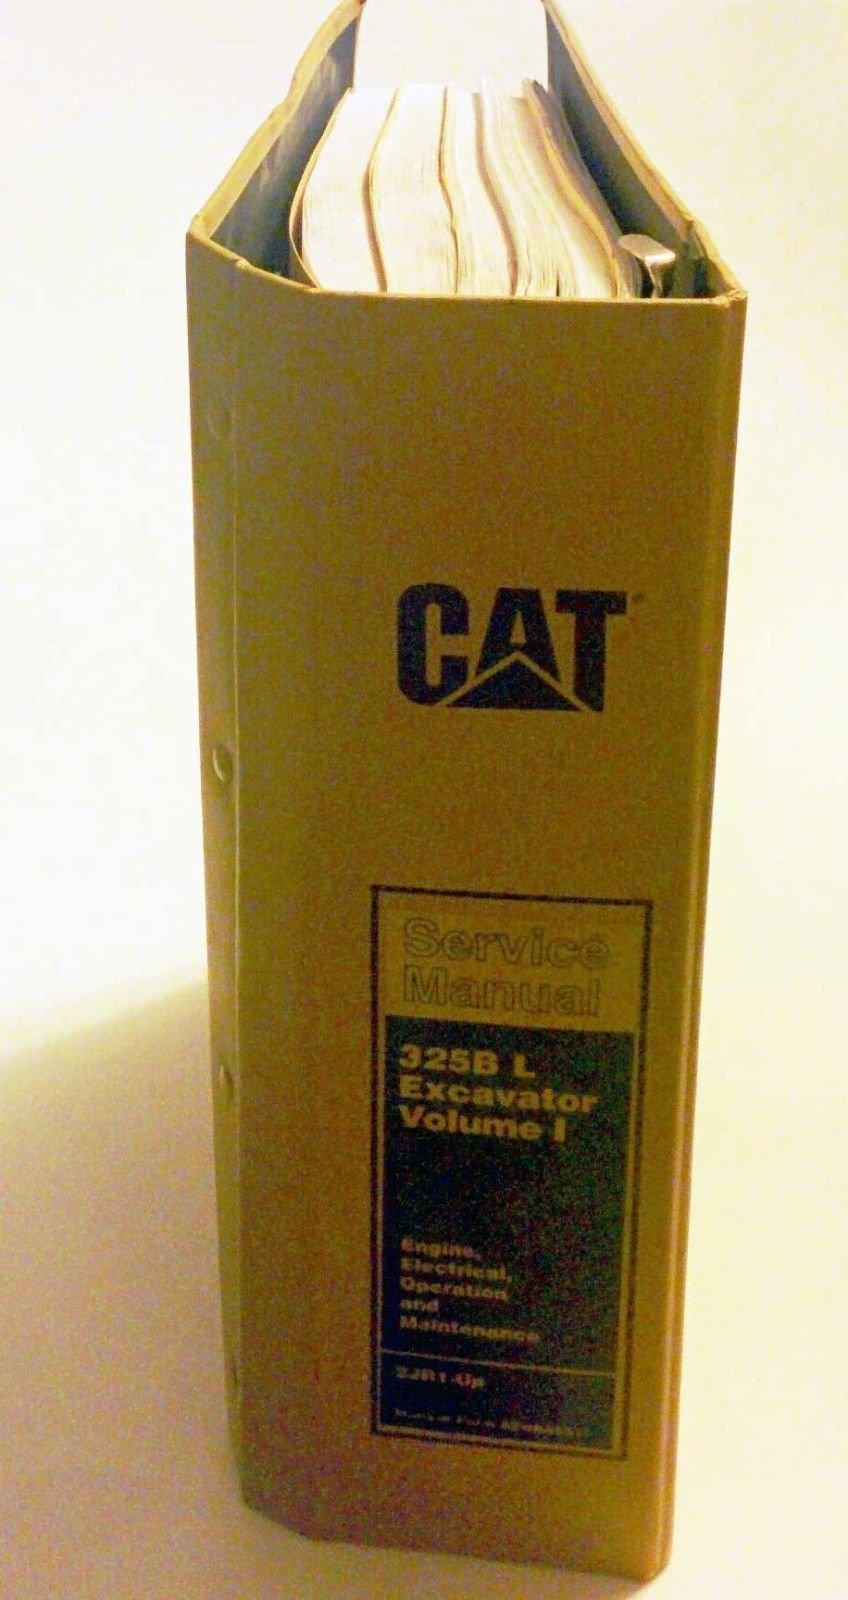 cat service manual 325b l excavator volume 1 engine, electrical, operation  and maintenance 2jr1 - up loose leaf – unabridged, 2007